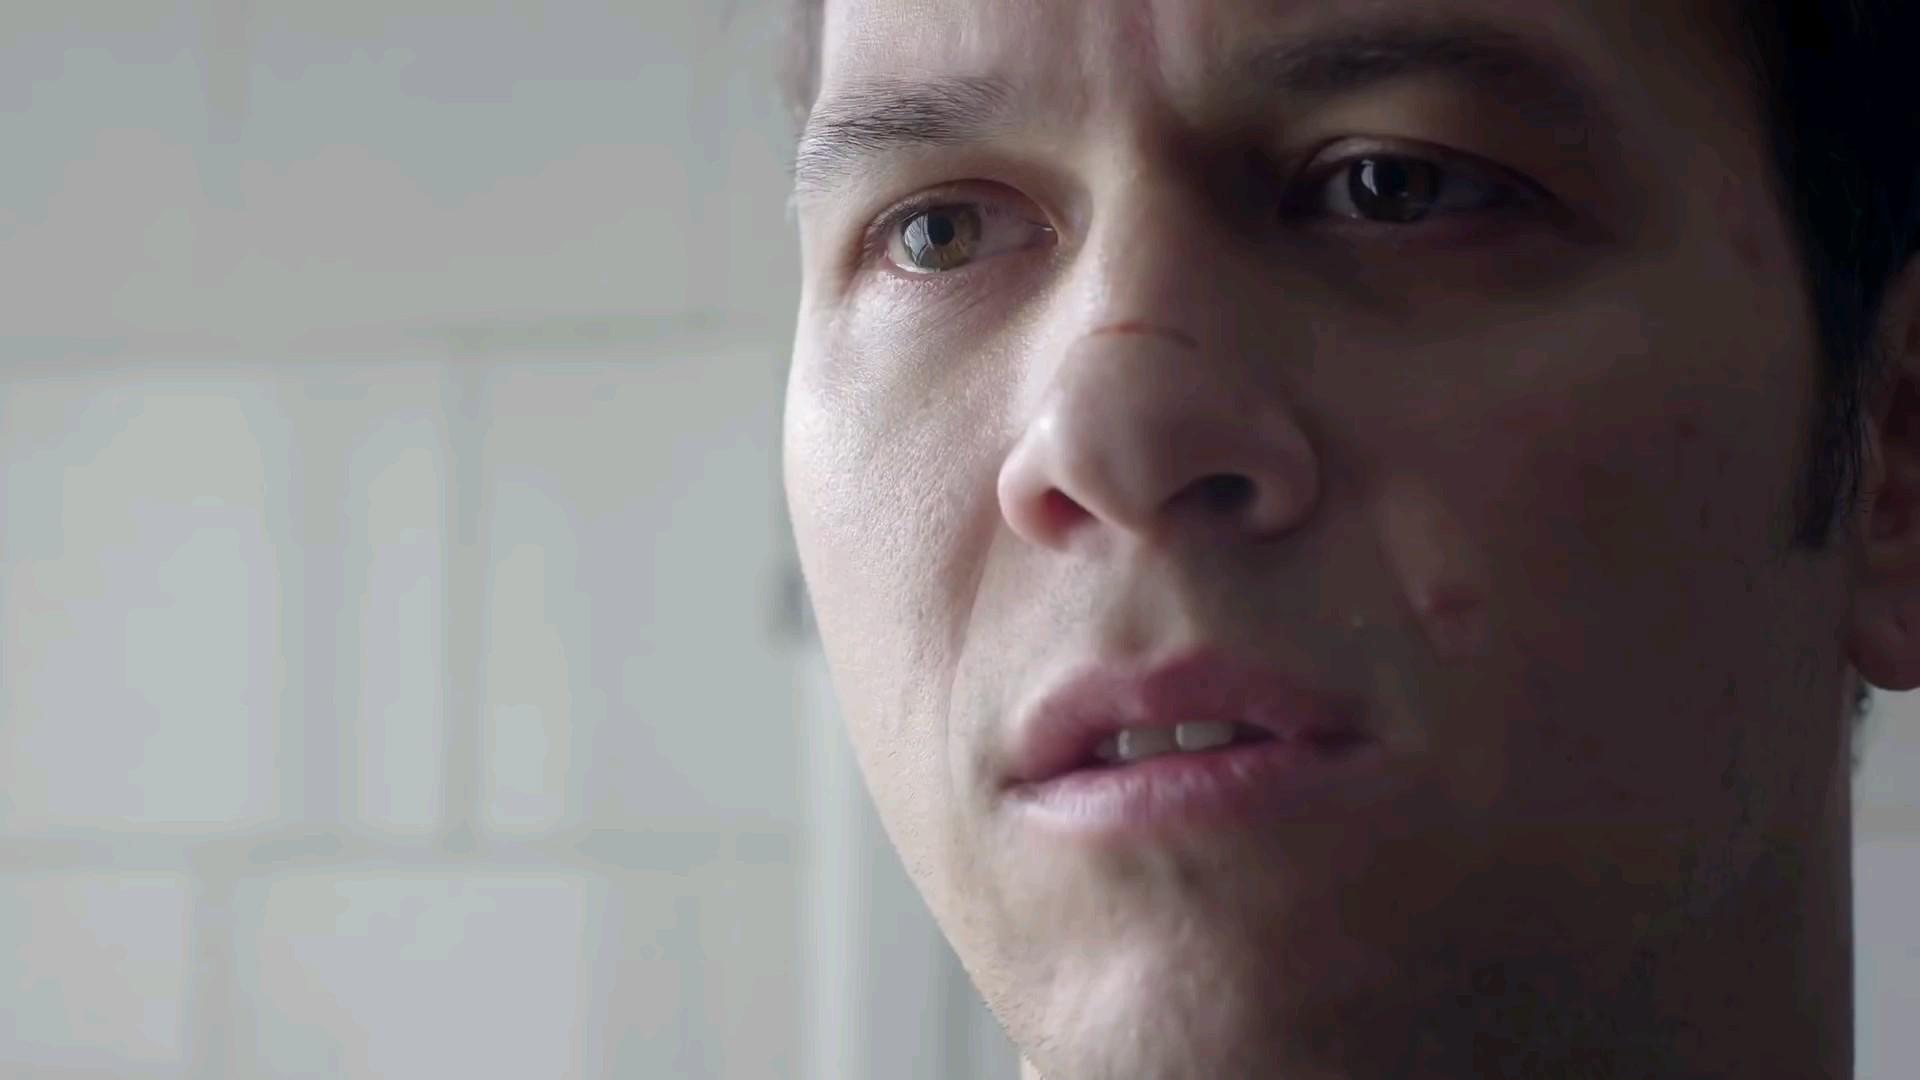 I?tirazım Var | 2014 | Yerli Film | NF | WEB-DL | XviD | Sansürsüz | m720p - m1080p | WEB-DL | Tek Link